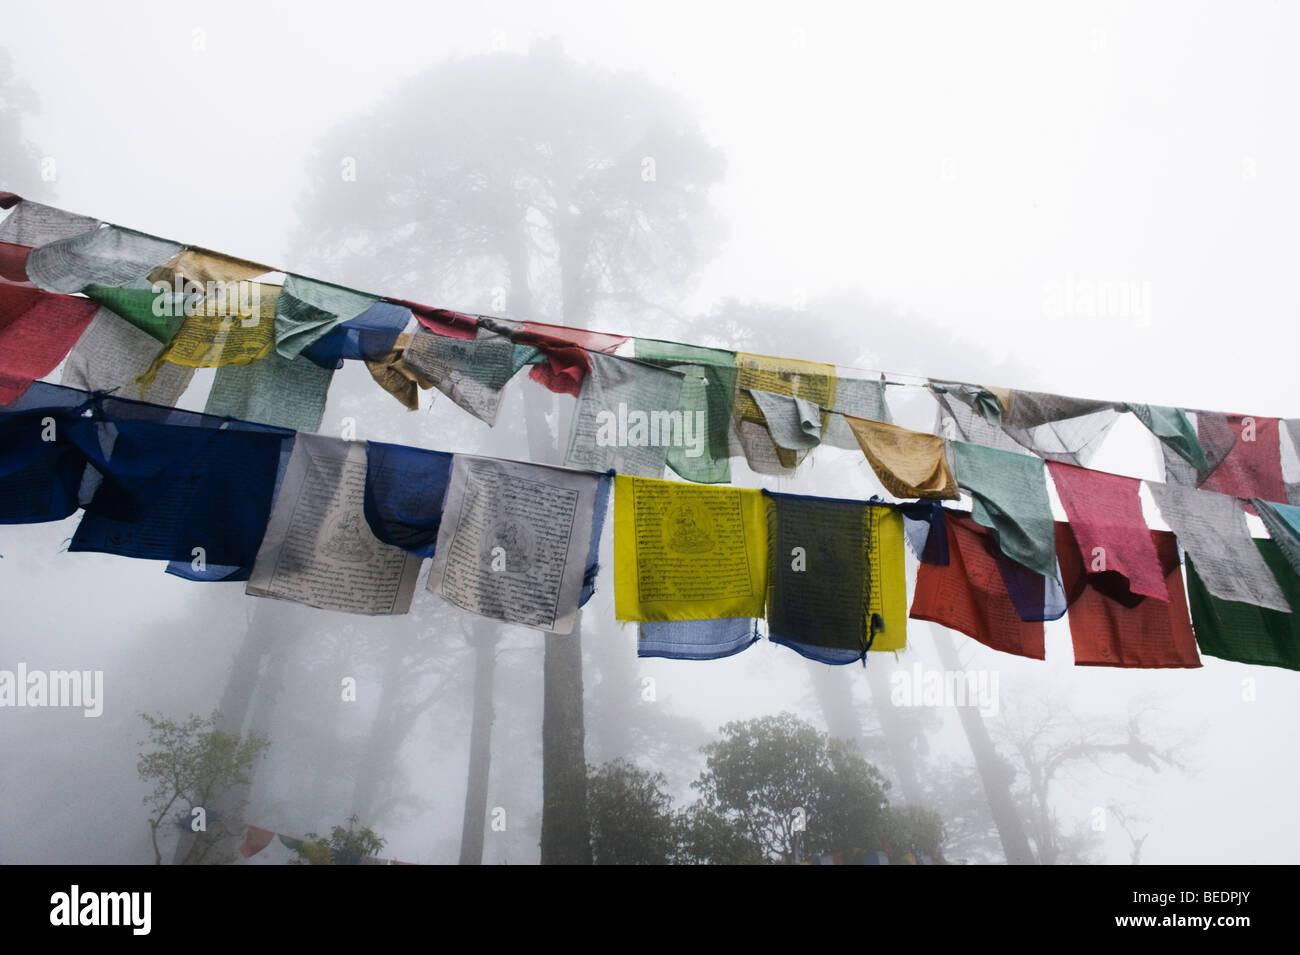 Prayer Flags in fog beneath tall Fir trees, Dochu La Pass, ca. 10,000 feet, BHUTAN - Stock Image